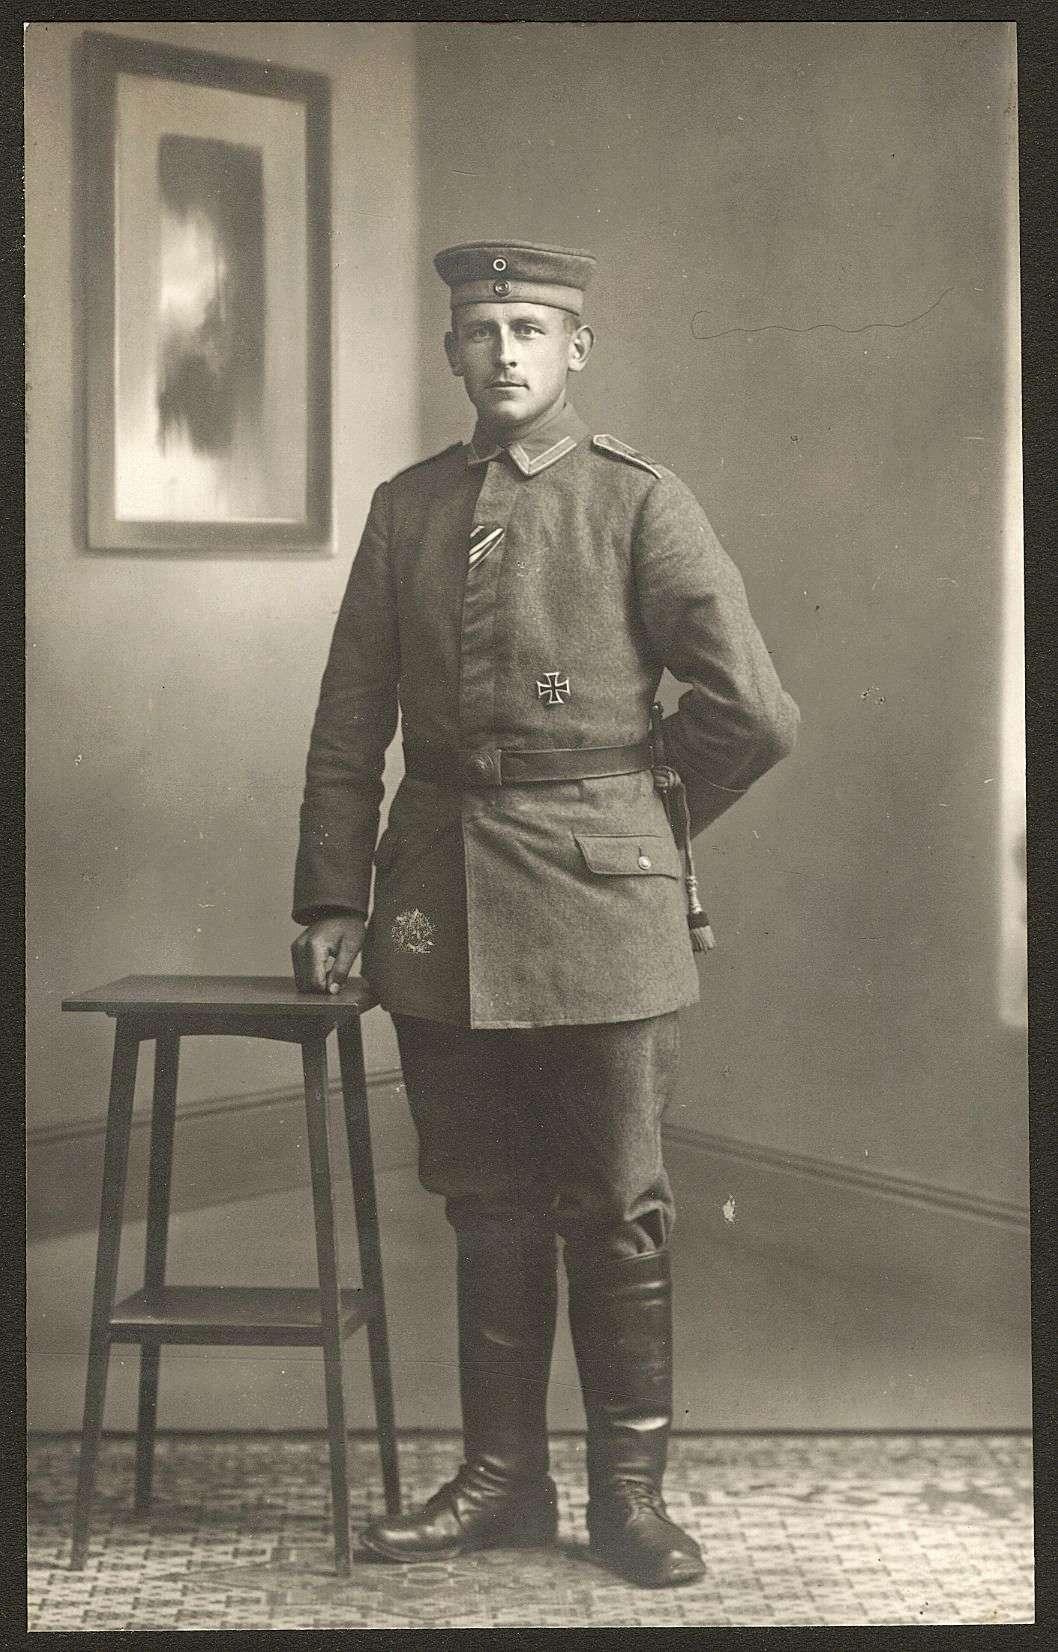 Bader, Robert, Bild 1